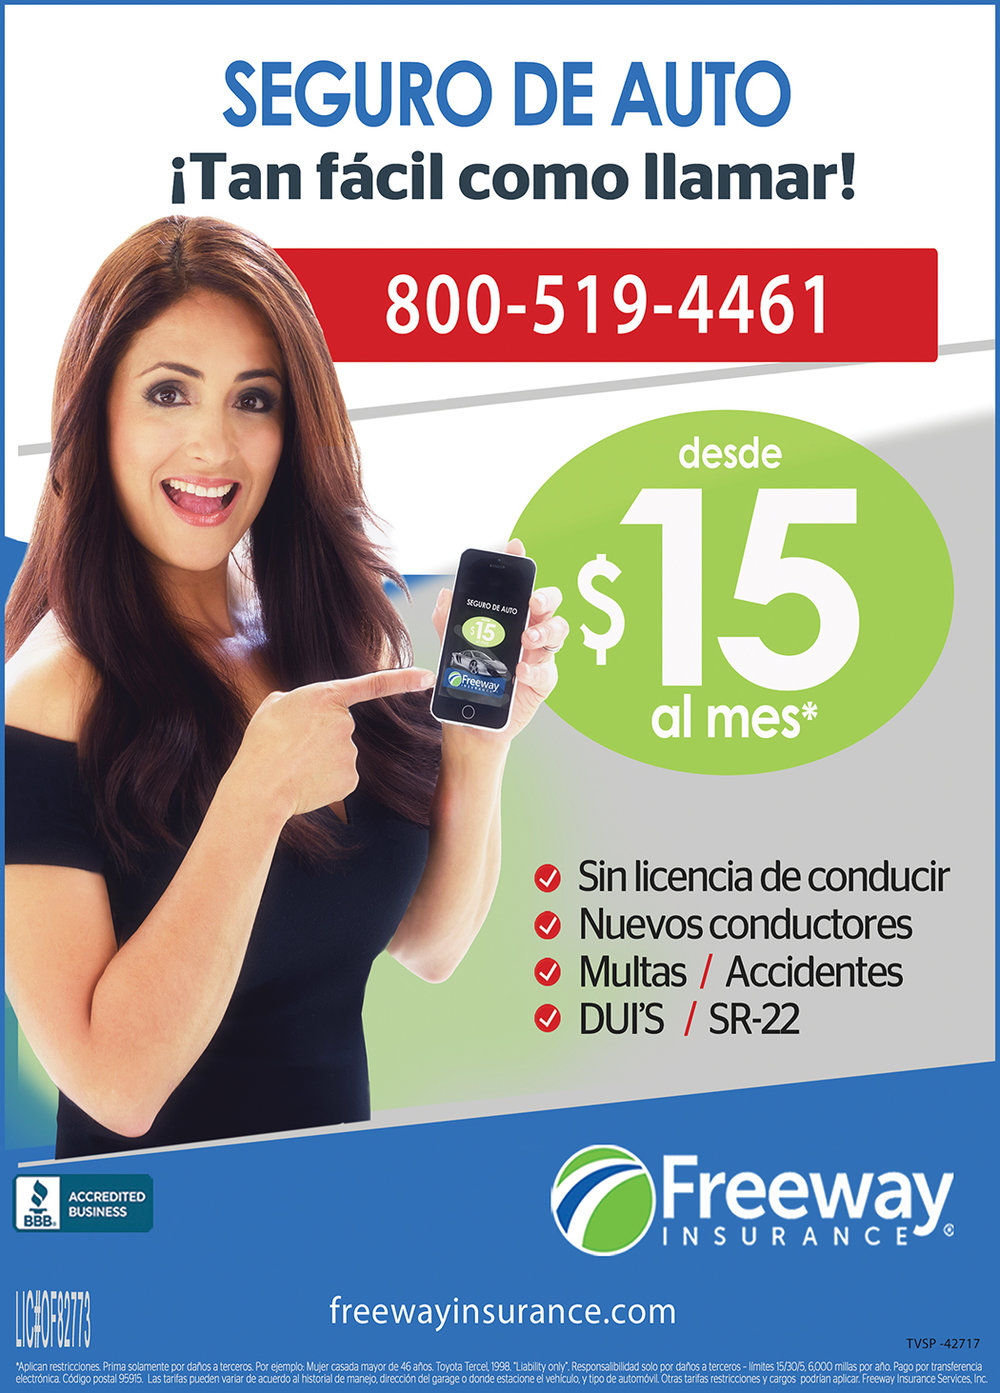 freeway Insurance - JUNIO 2017 copy.jpg